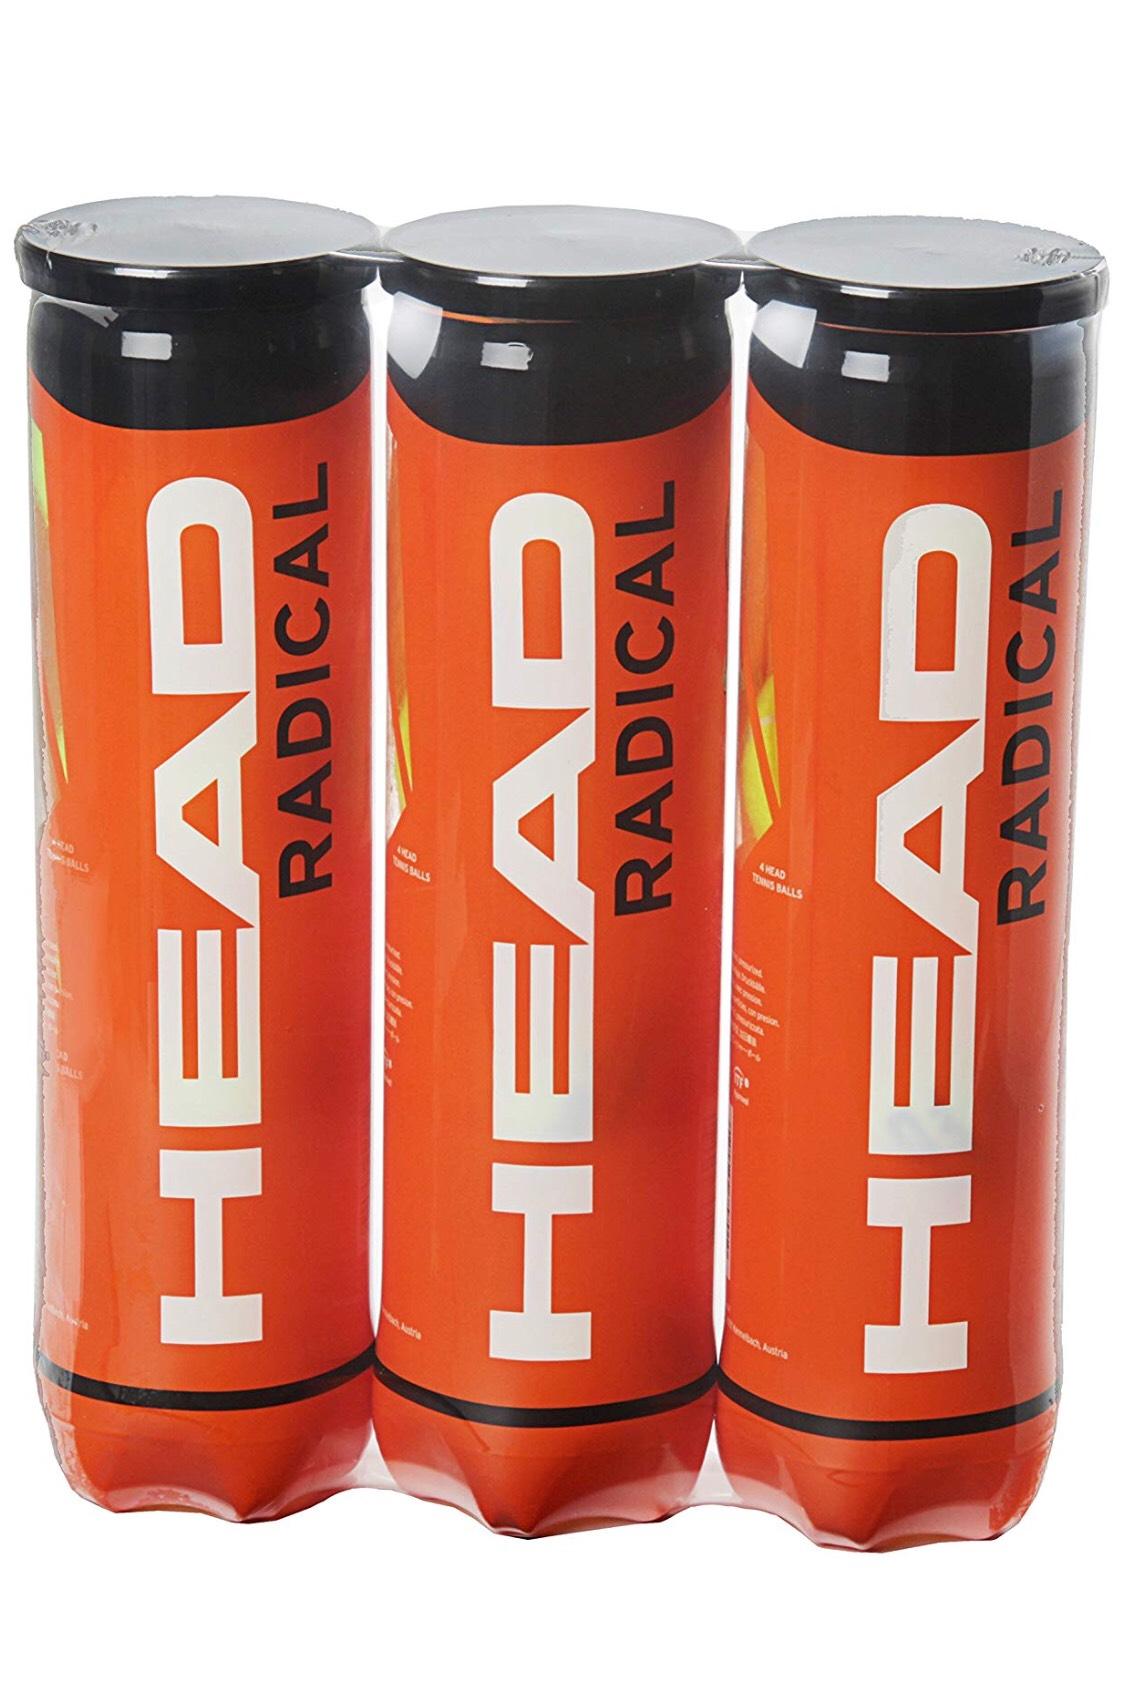 Triple pack (12 balls) Head Radical Tennis Balls - £8.99 @ Amazon Prime Day lightning deal